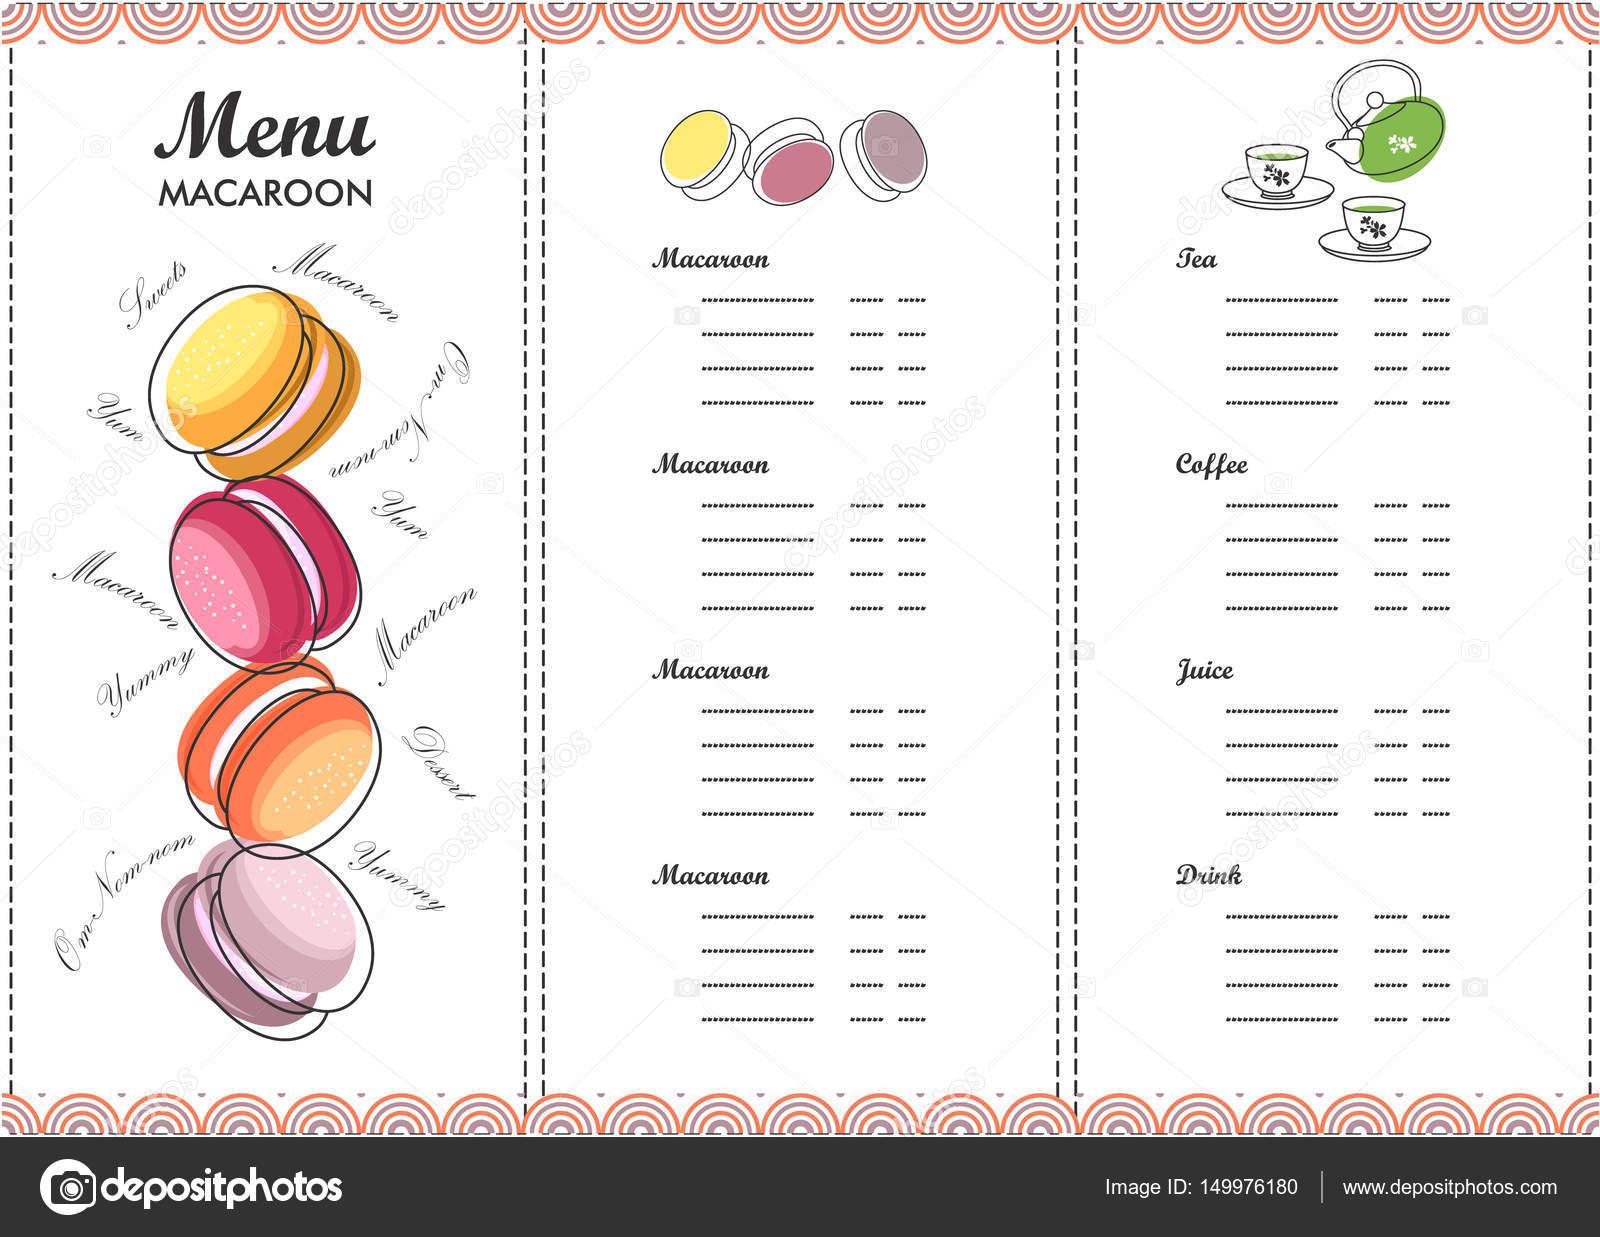 Menü-Design-Vorlage-dessert — Stockvektor © marrishuannna #149976180